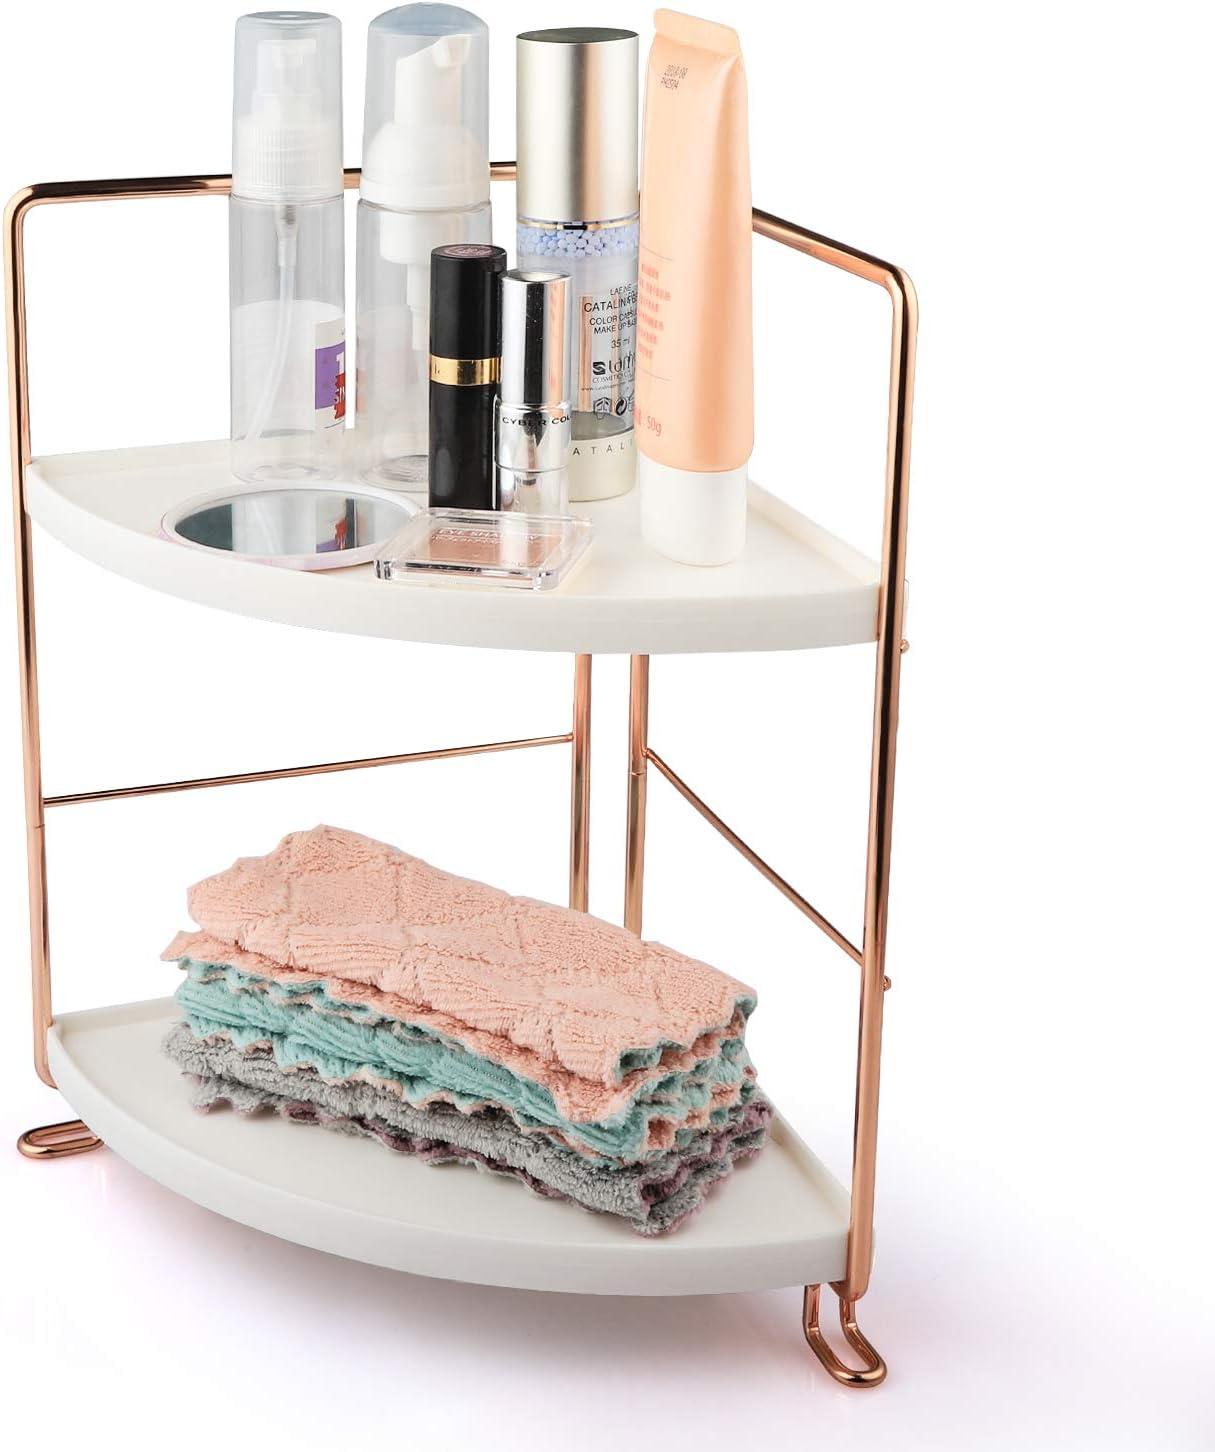 VEEMOS 2-Tier Corner Counter Shelf Bathroom Countertop Organizer Vanity Tray for Cosmetic Storage Standing Skincare Organizer Spice Rack (Rose Gold)